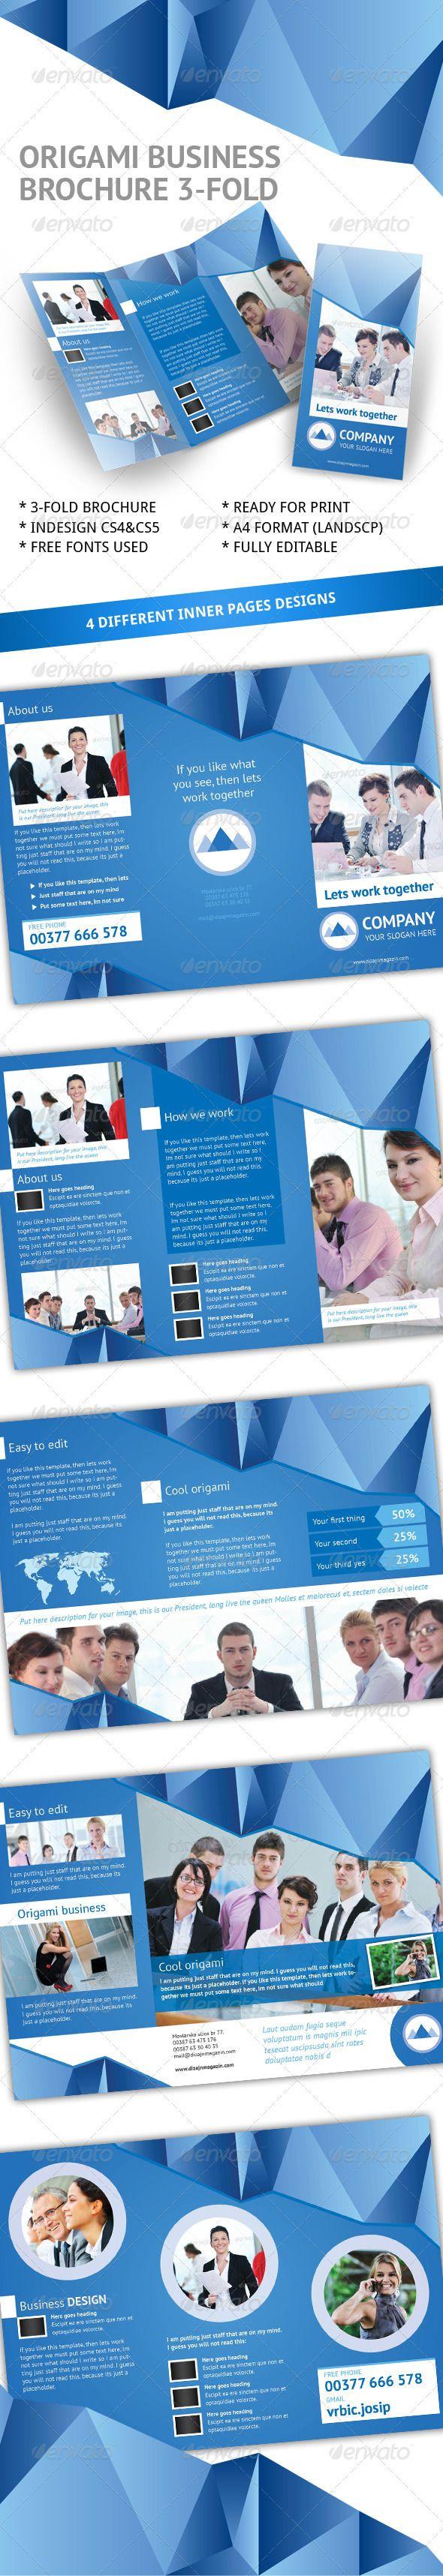 business origami 3 fold brochure indesign template book design